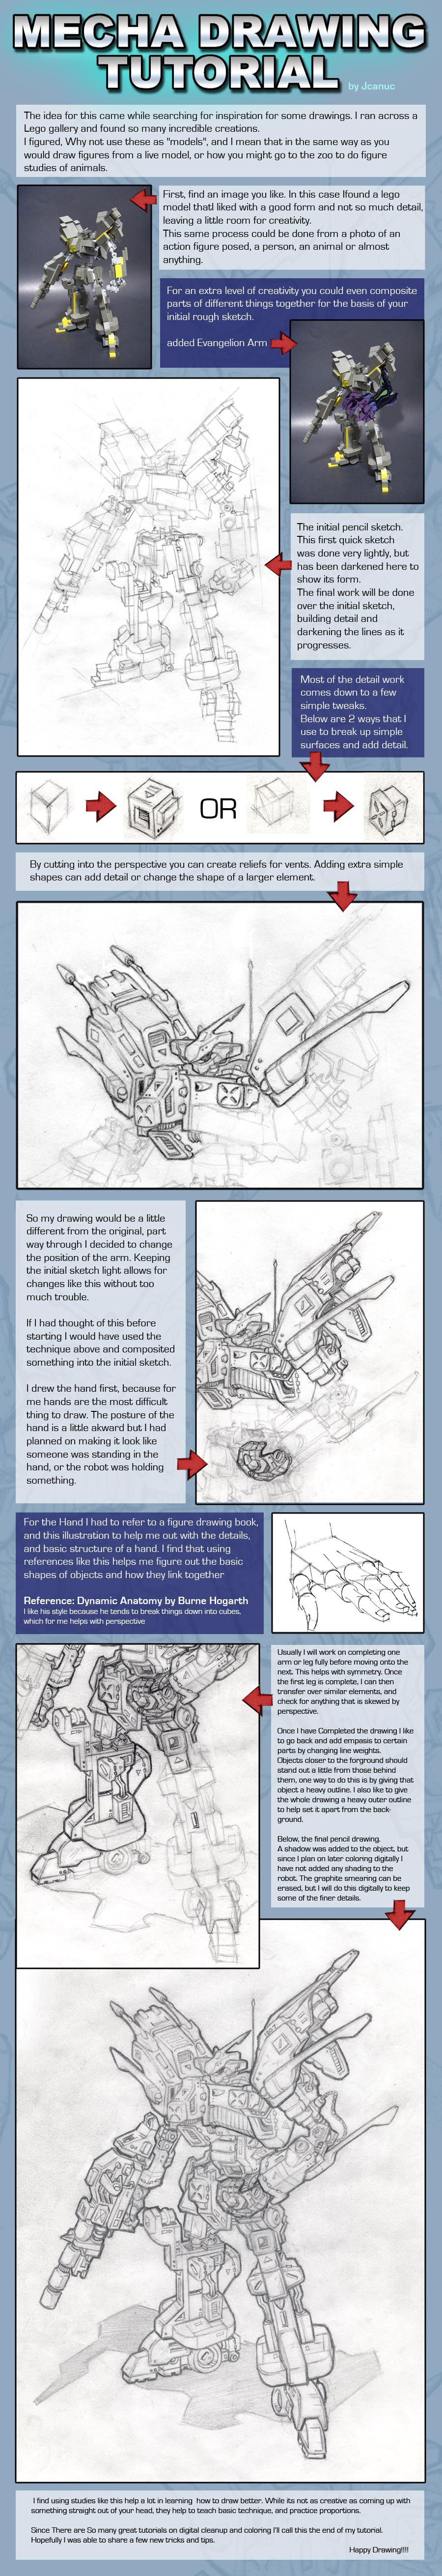 Mecha Drawing Tutorial by jcanuc